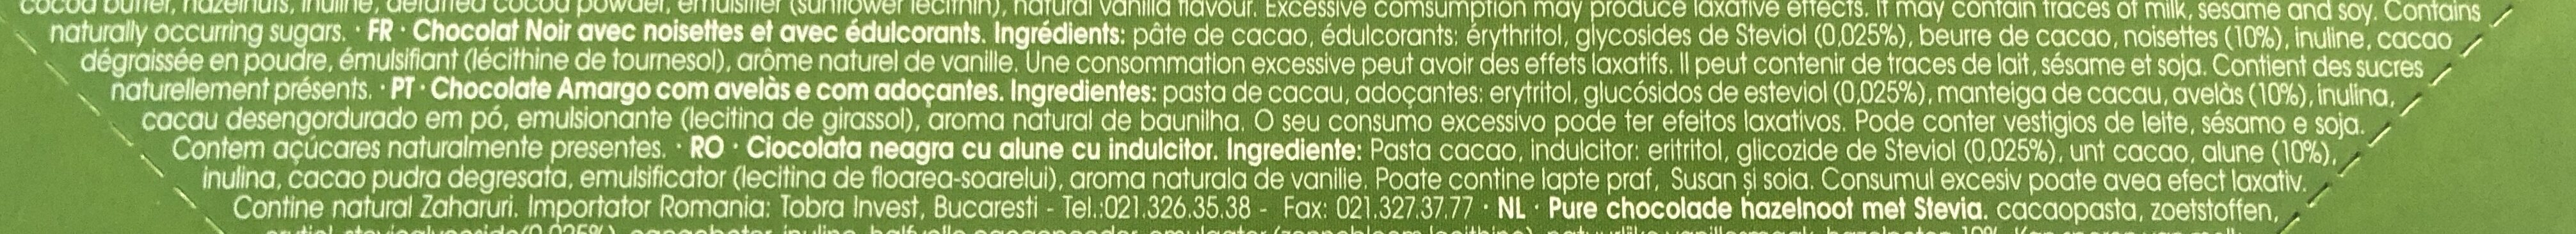 Chocolate negro con avellanas - Ingredients